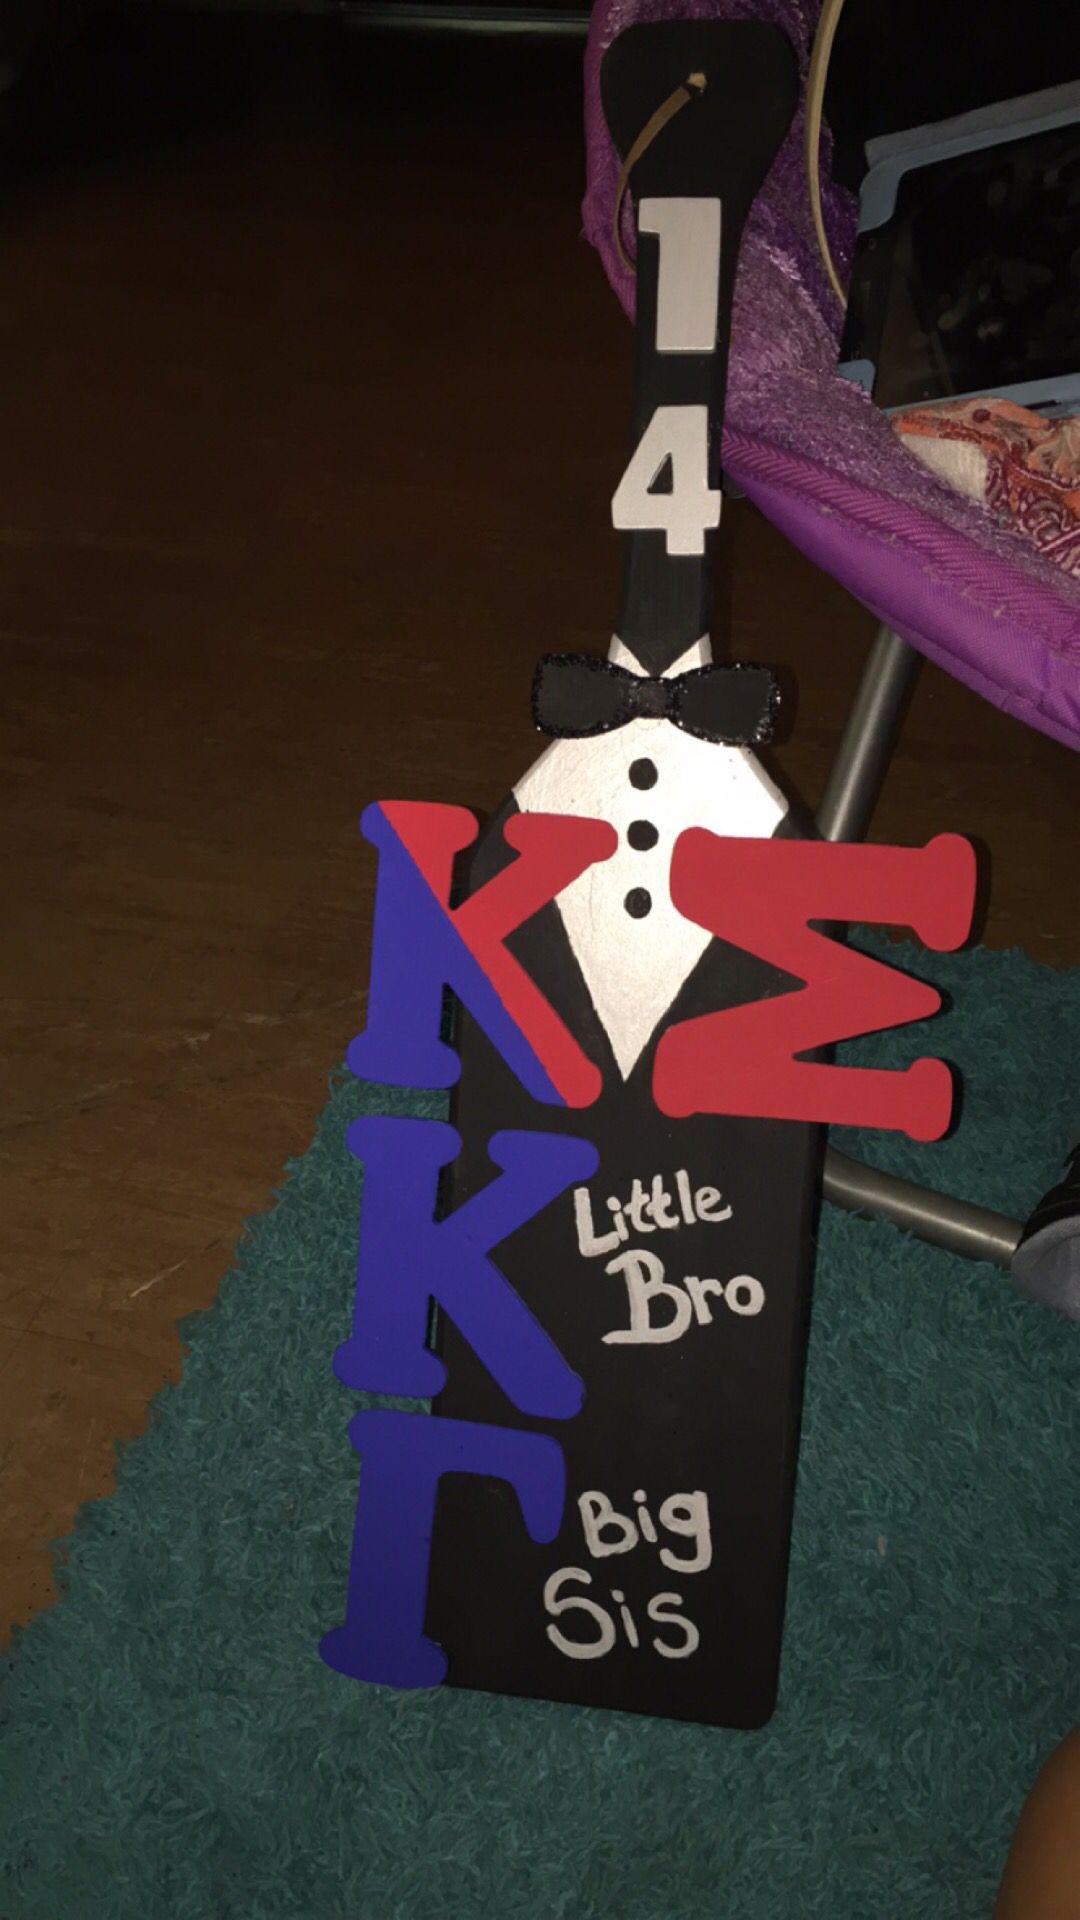 Little bro big sis kappa kappa gamma kappa sigma Greek paddle